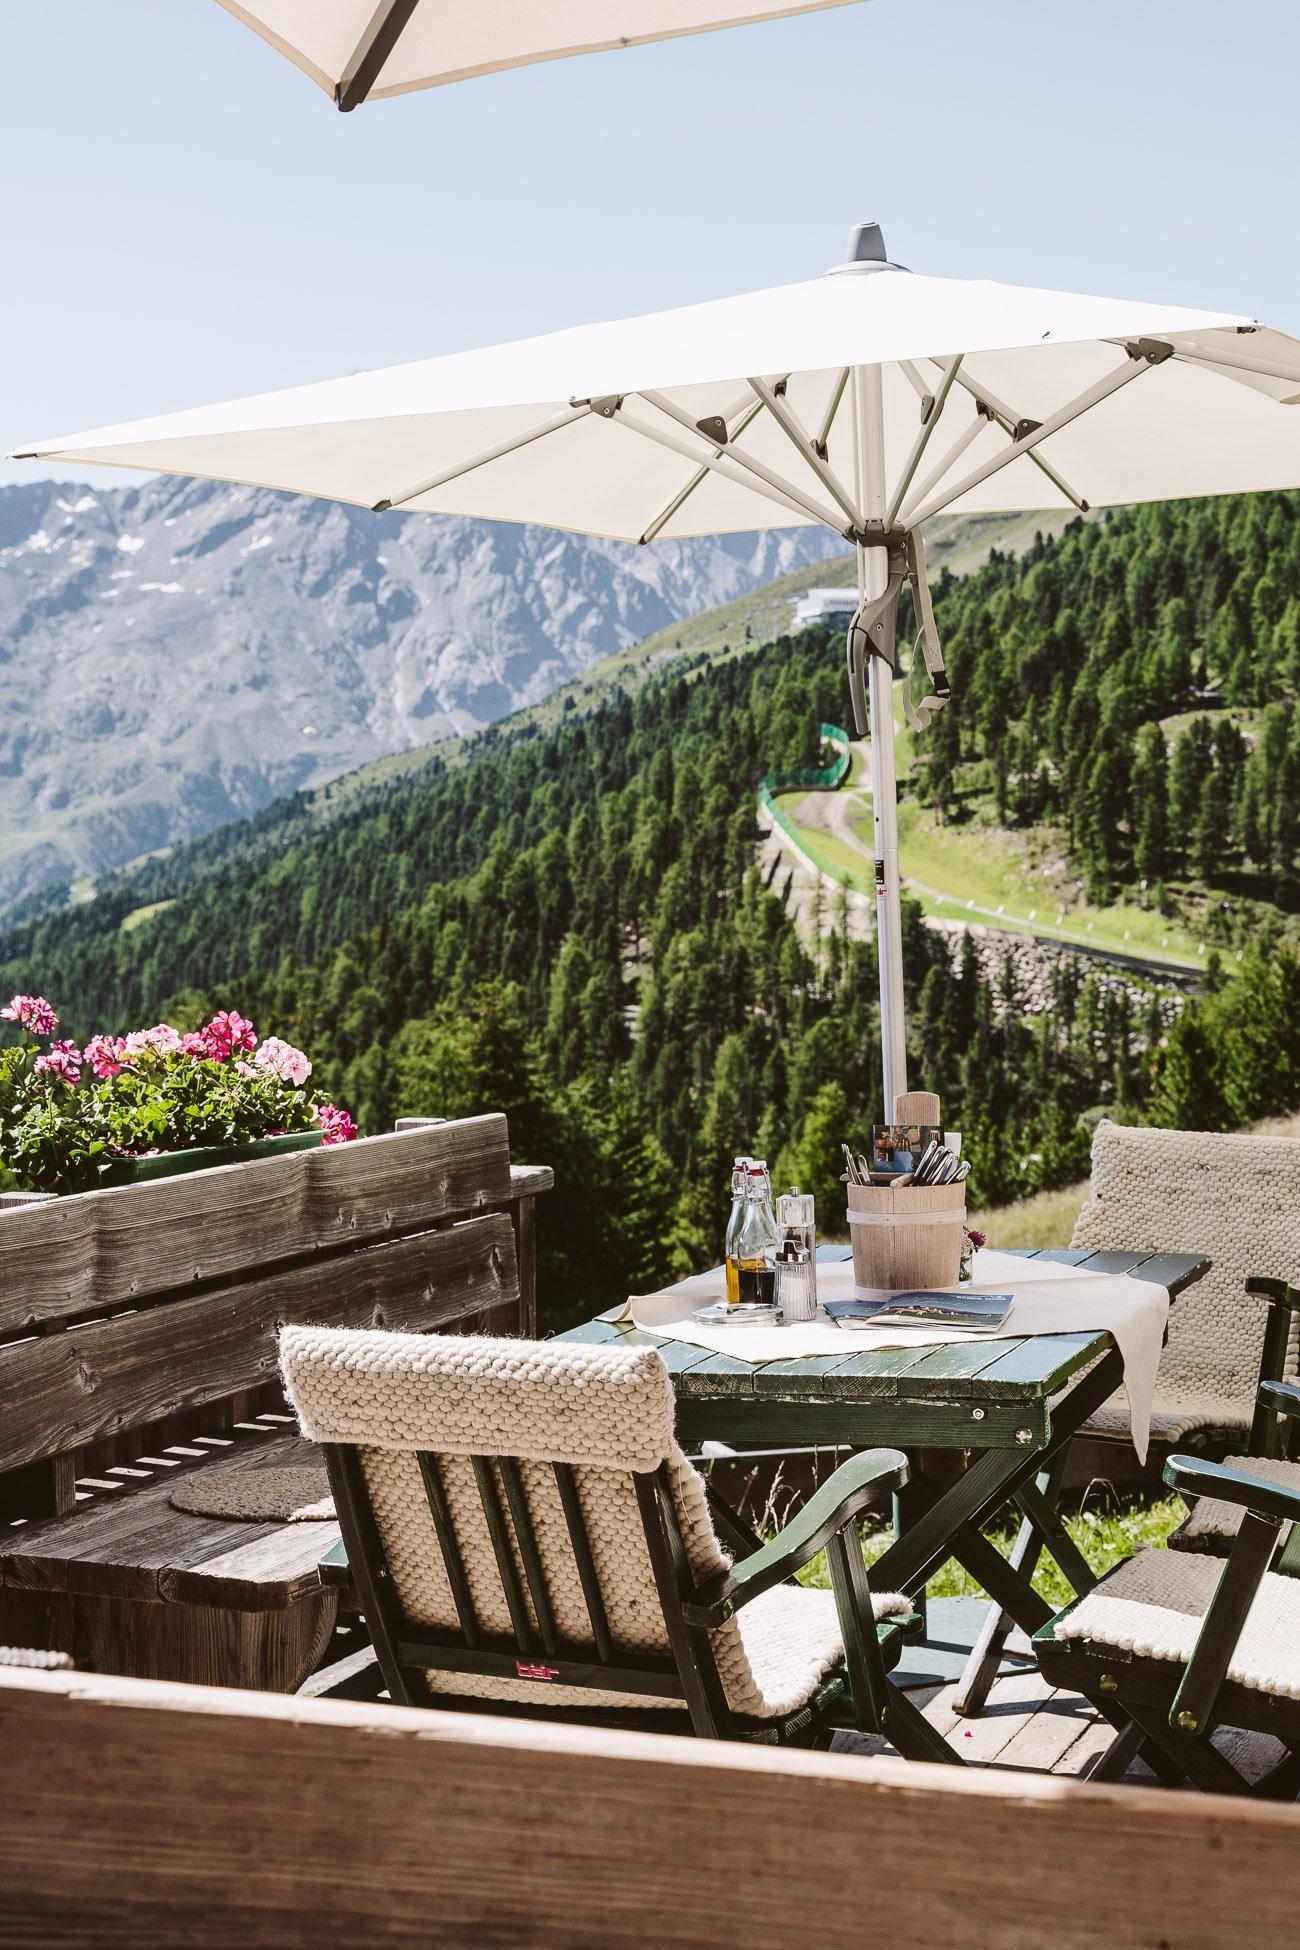 Gampe Thaya Oetztal Tyrol